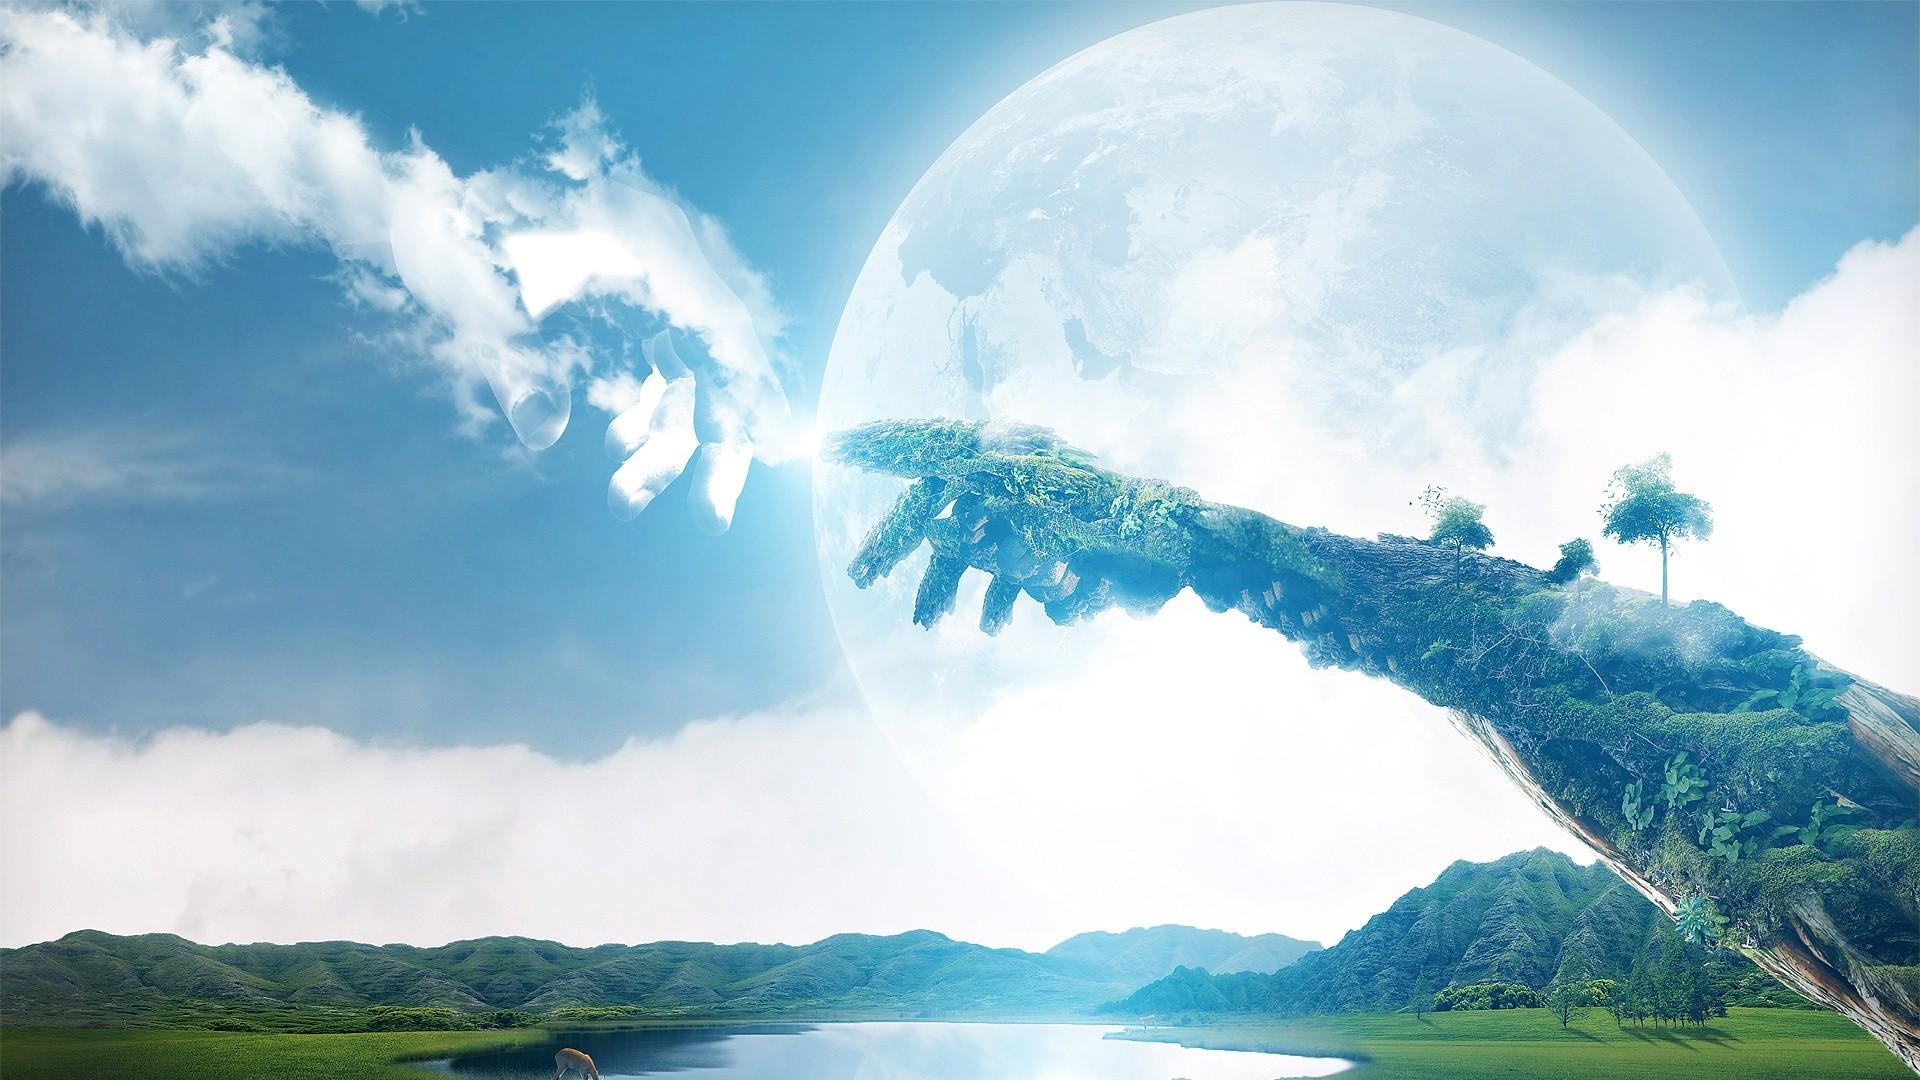 3D Nature 1080p HD Wallpapers | Widescreen Wallpapers| High .